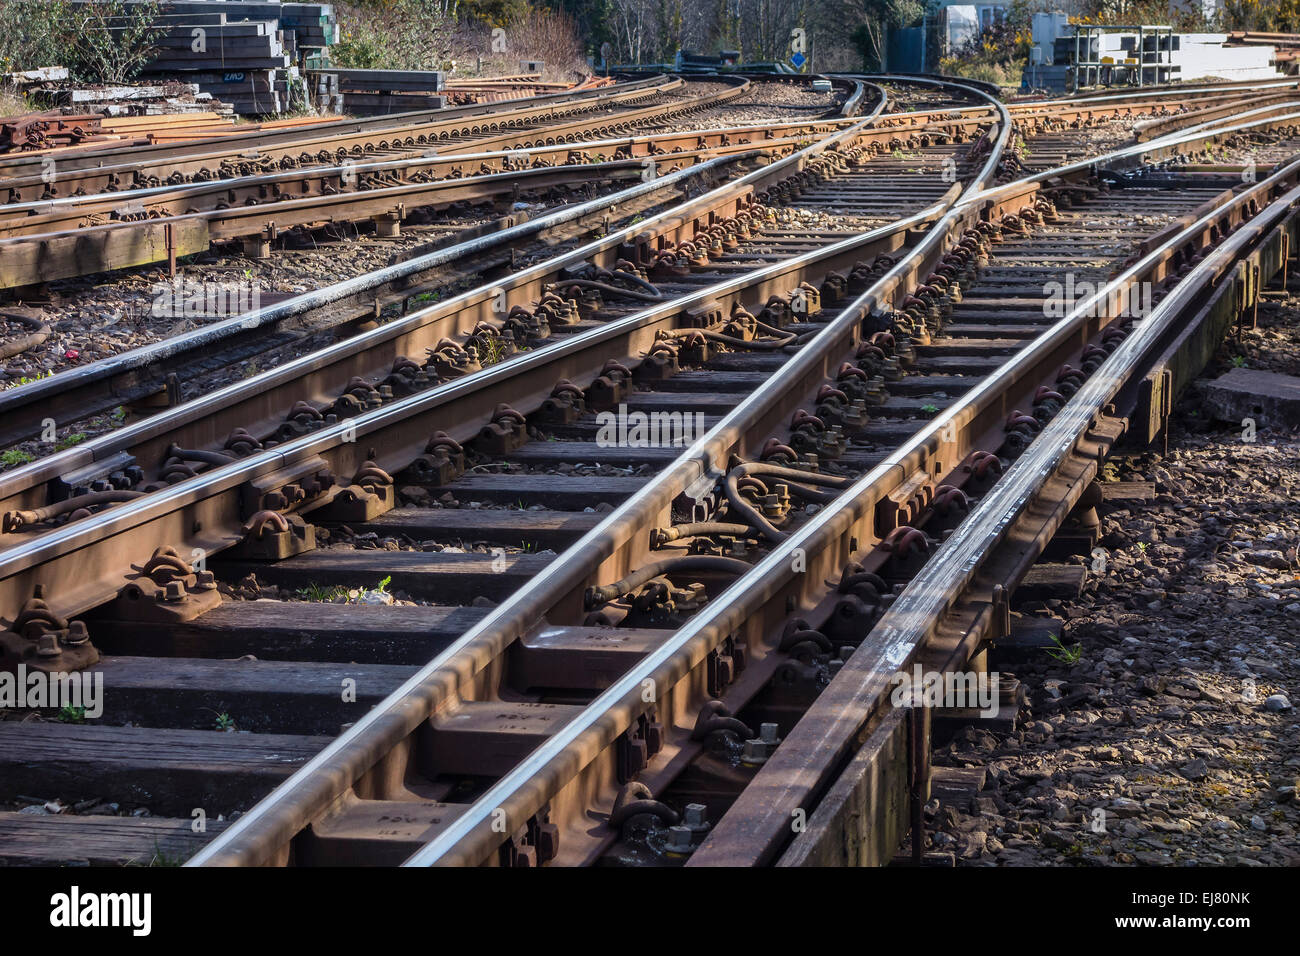 Railway Lines at Branksome, Dorset, England, UK - Stock Image